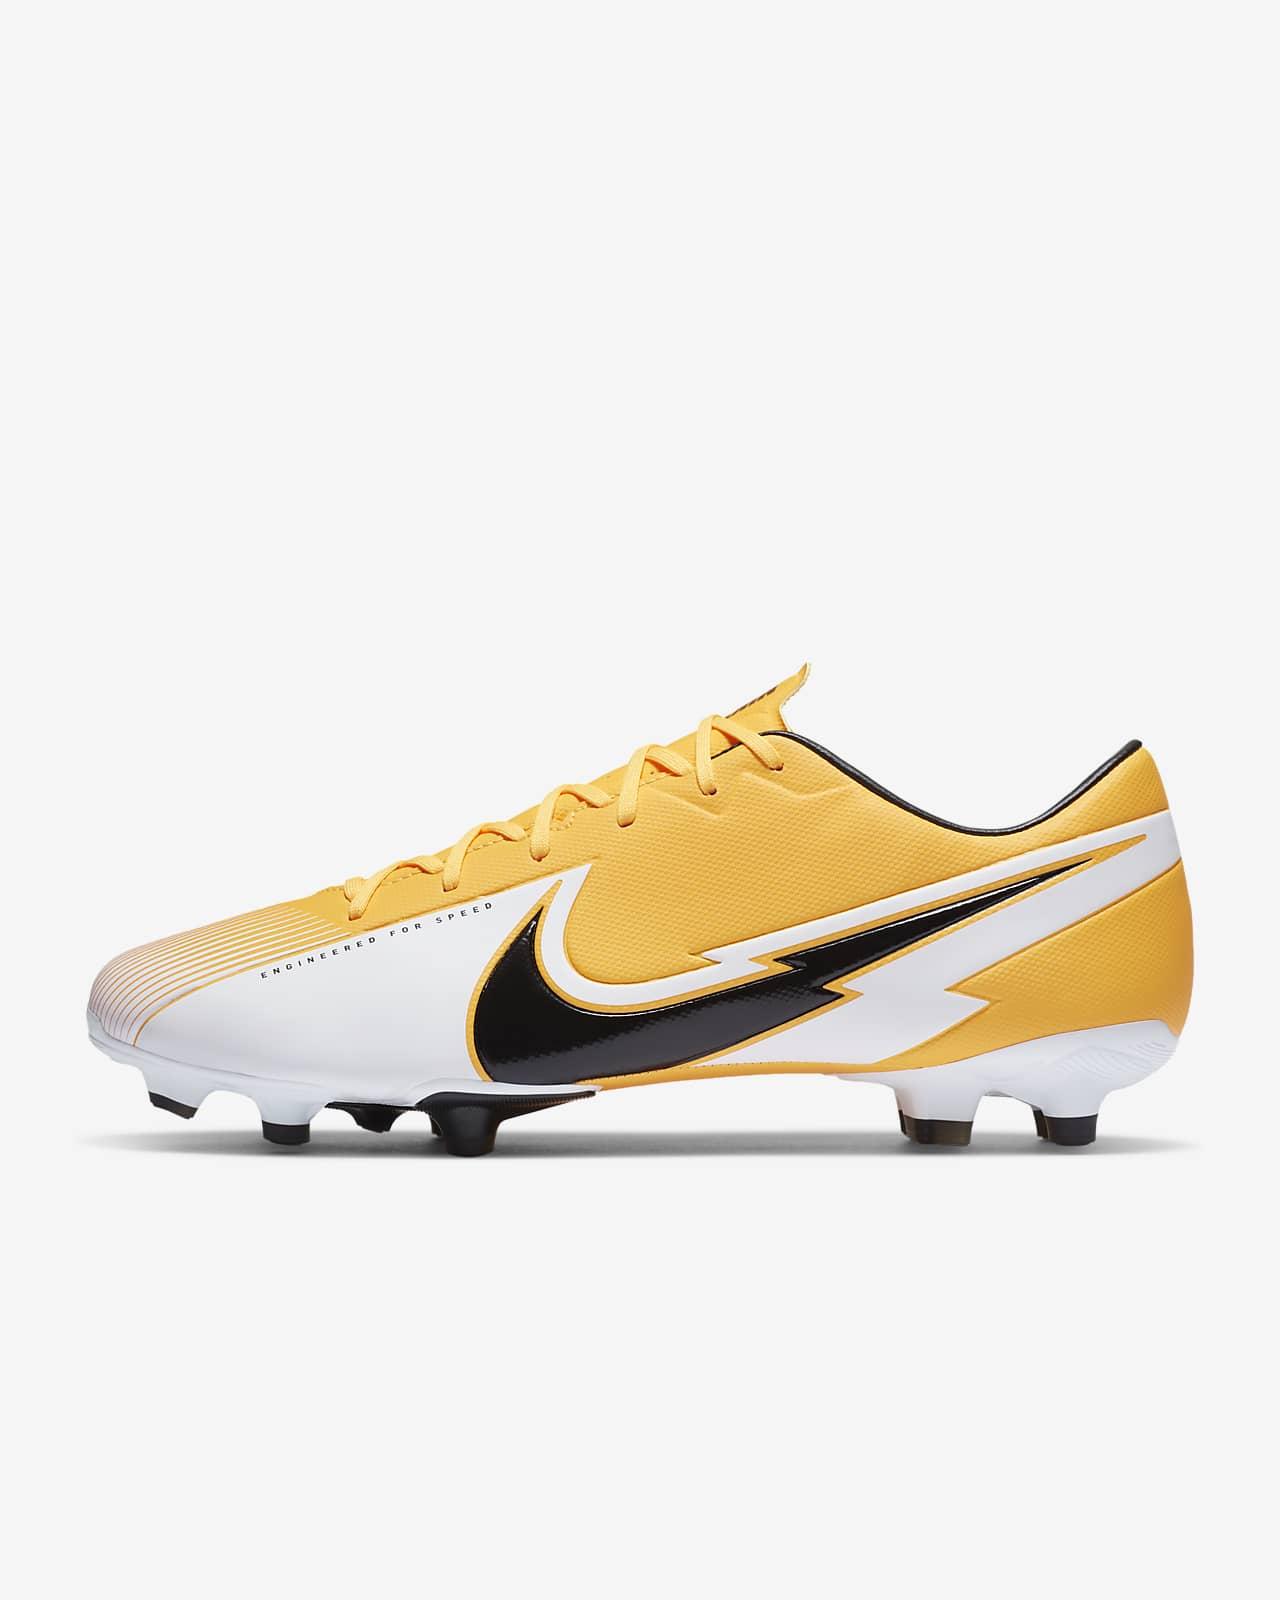 Chaussure de football multi-surfaces à crampons Nike Mercurial Vapor 13 Academy MG